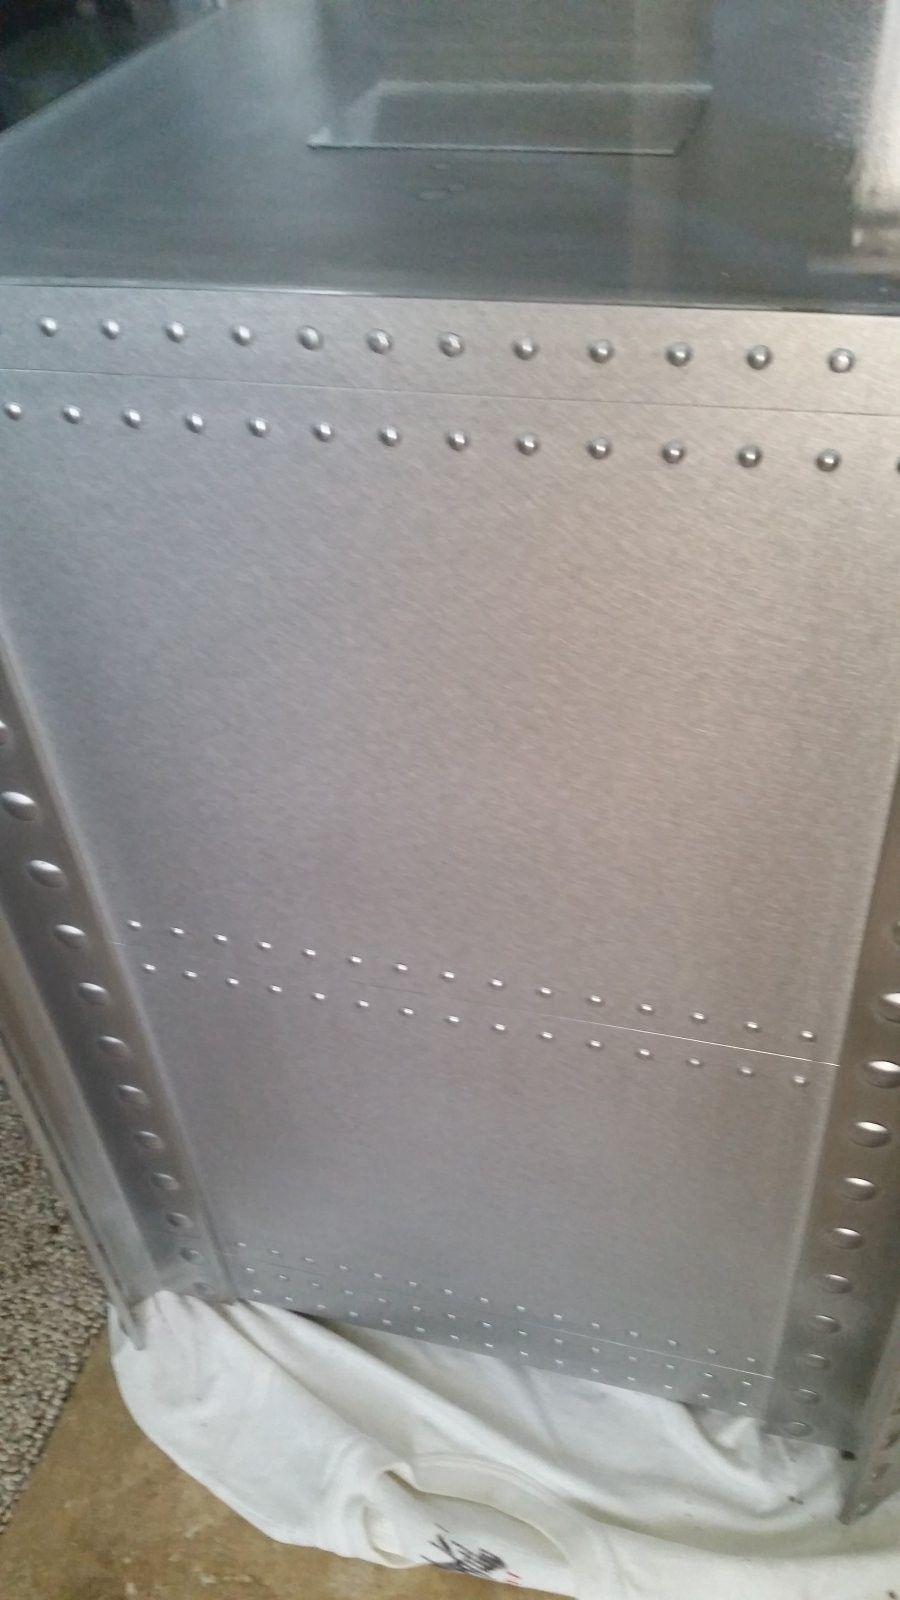 Aluminum Display Case - Polish Product Review - 20140906_171714.jpg